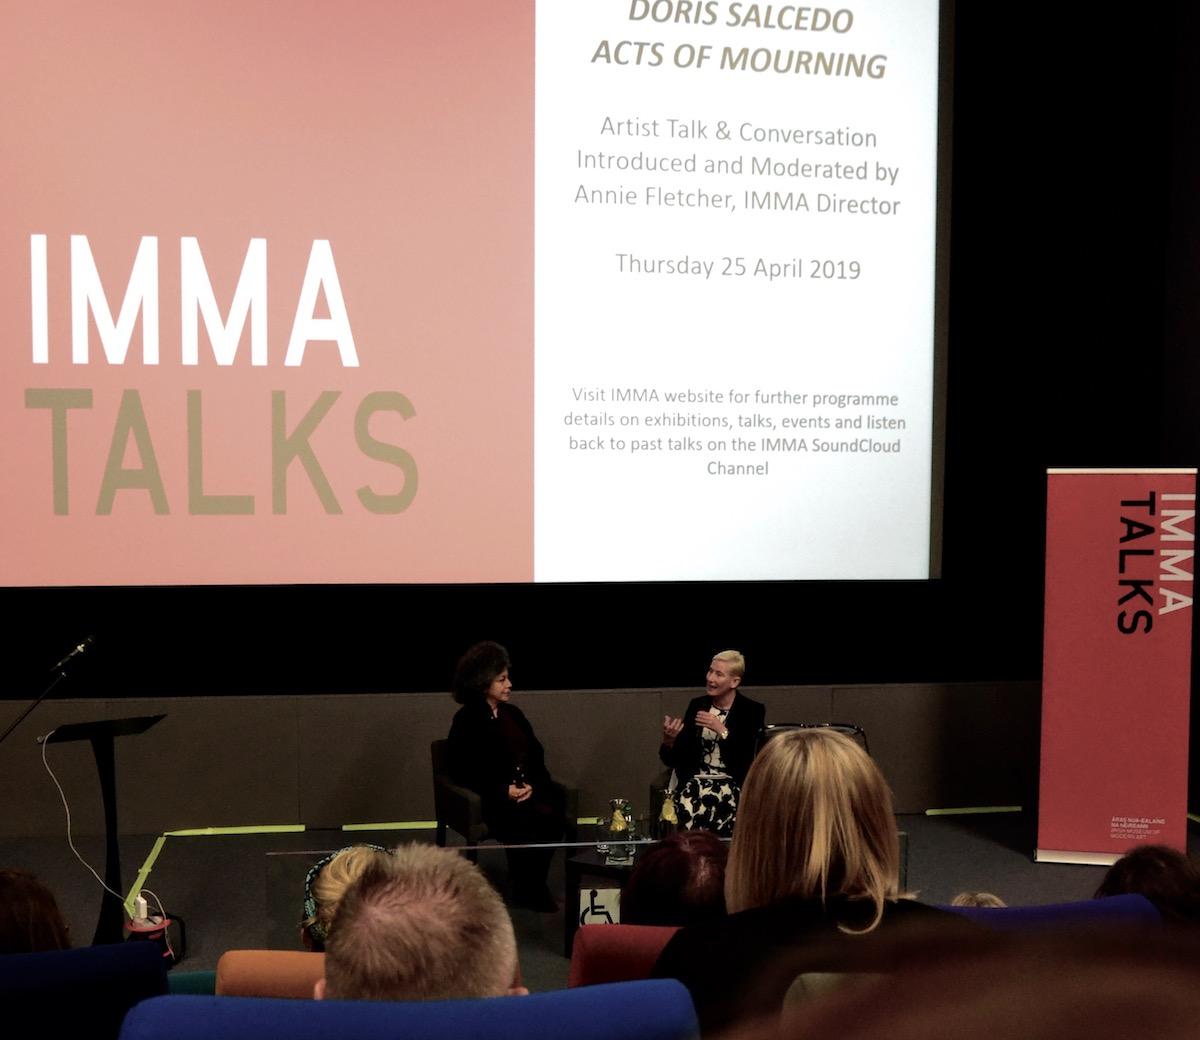 Doris Salcedo in conversation with Annie Fletcher, IMMA Talk at the Lighthouse Cinema. Photography: Dahlia Dreven.